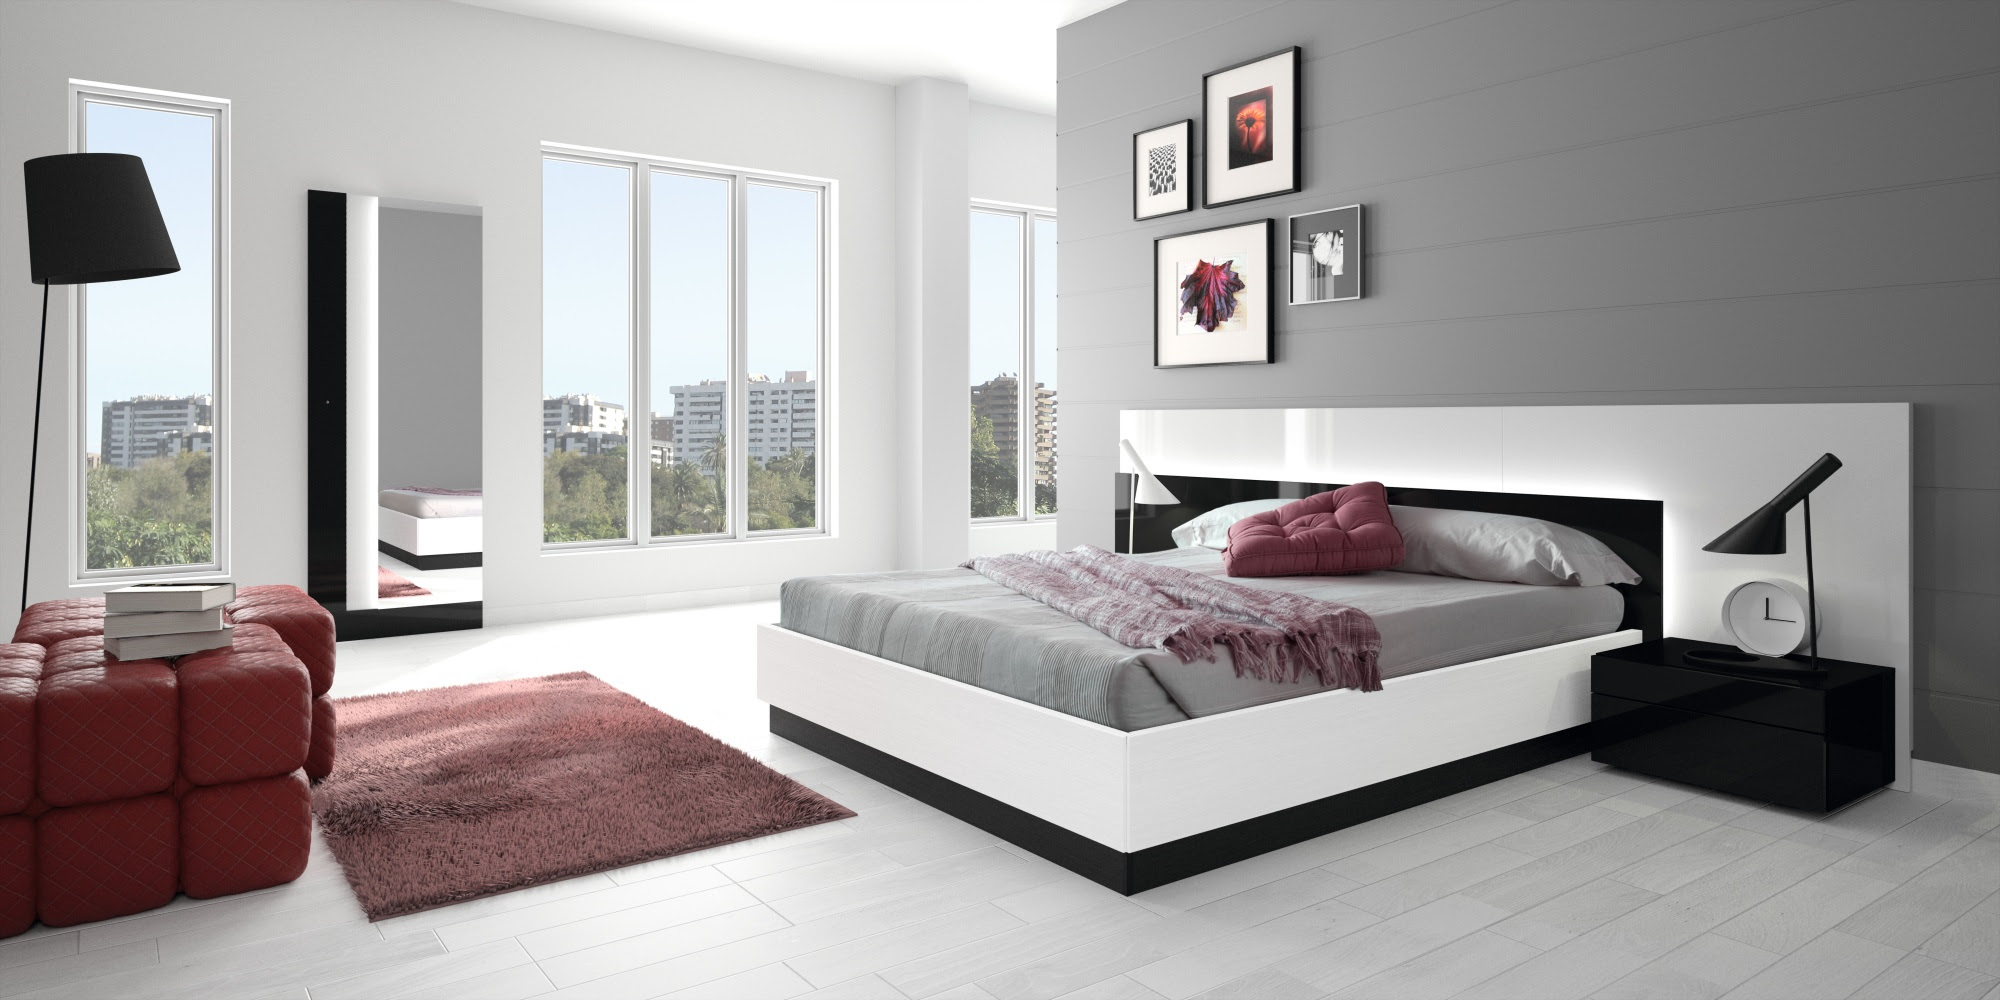 Romantic bedroom interior design HD wallpapers | HD ...